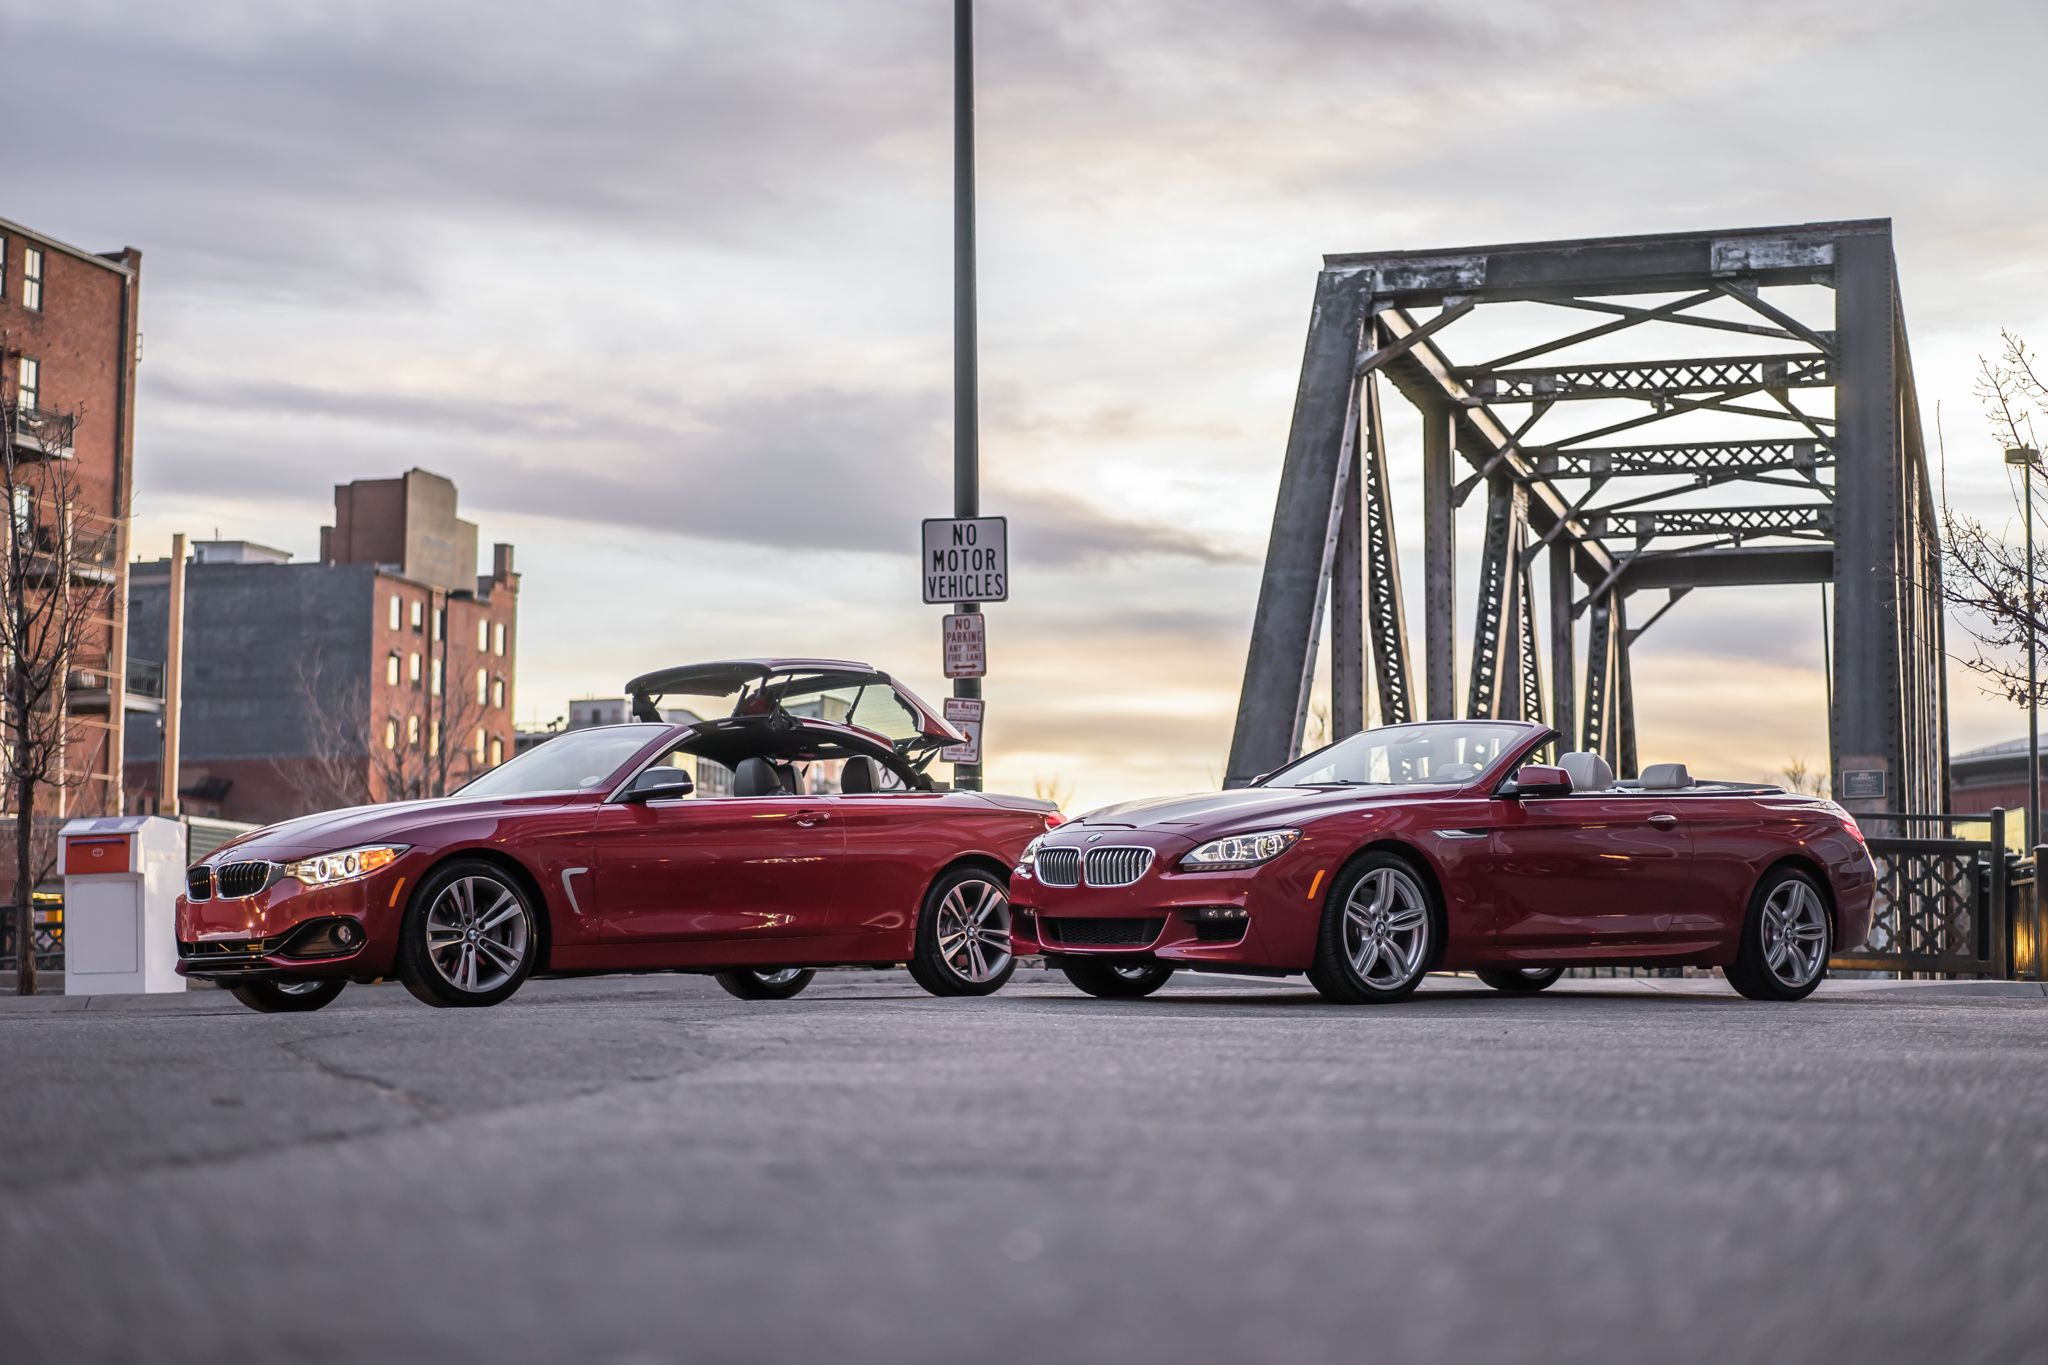 BMW in Colorado  BMW in Denver  red BMW  BMW  Bimmer  Denver